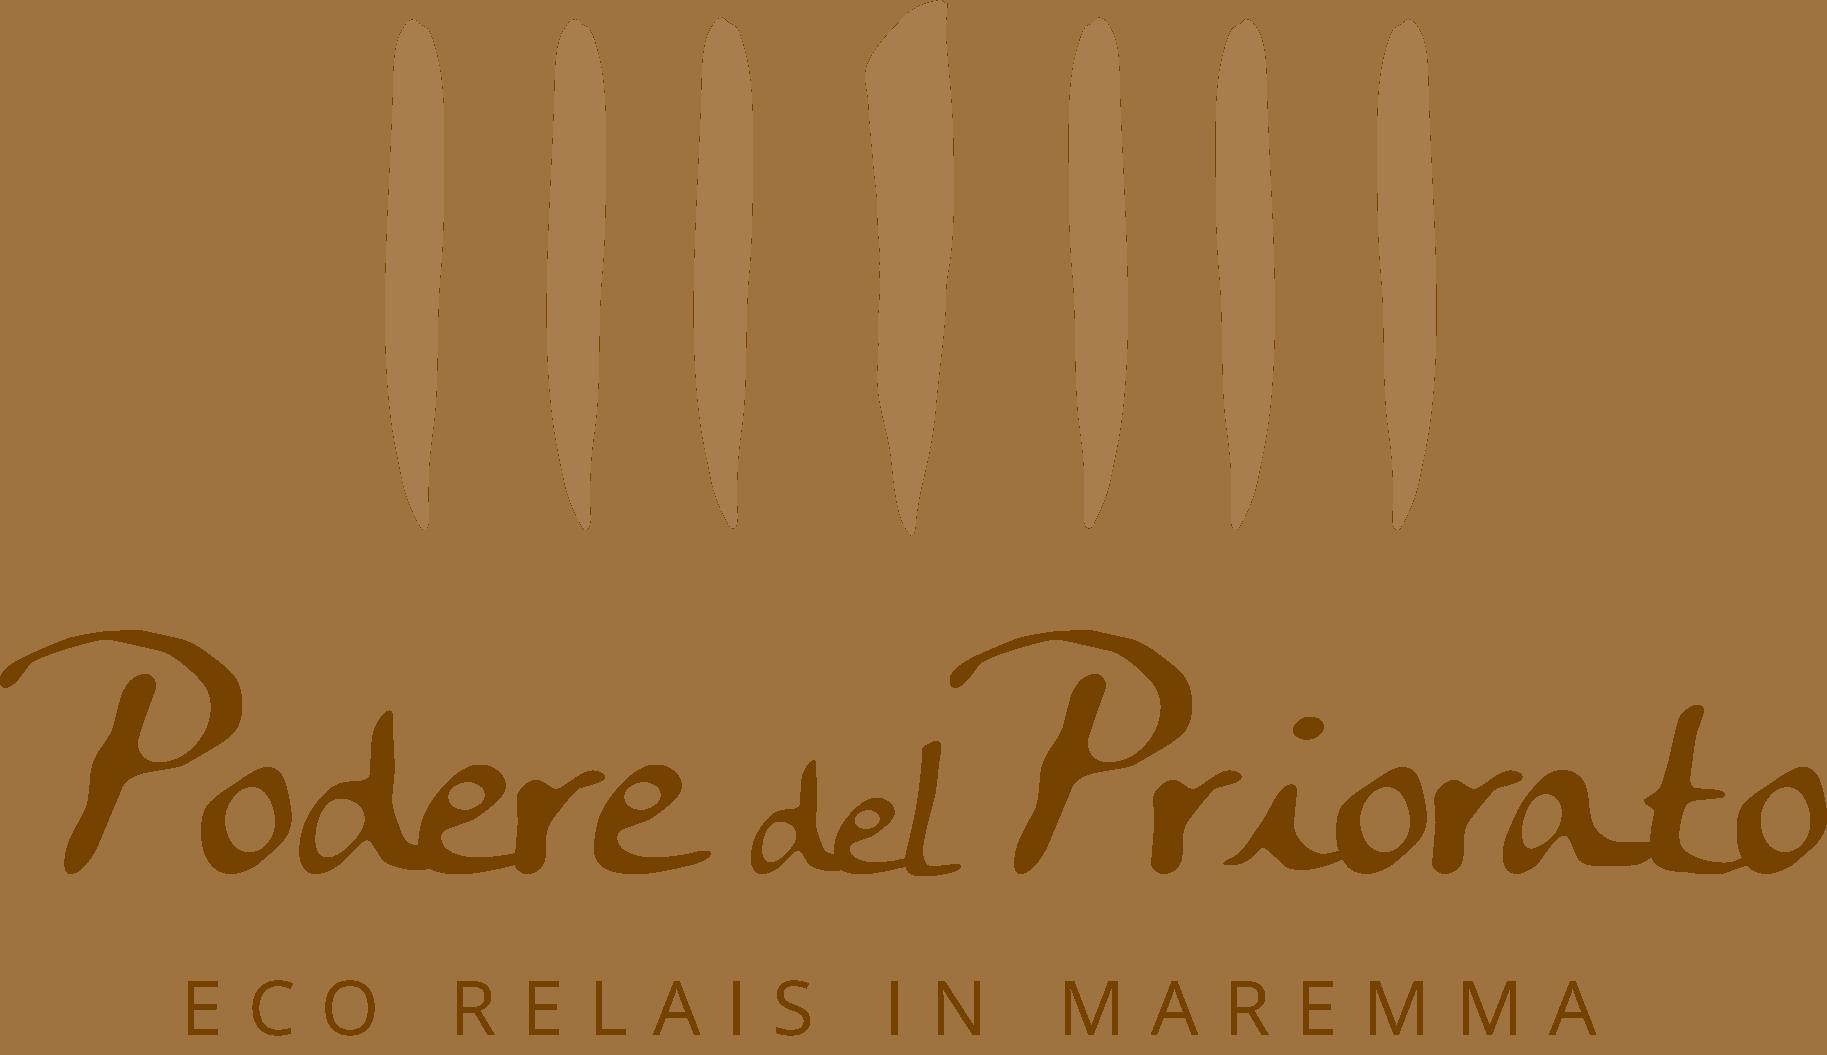 http://poderedelpriorato.it/